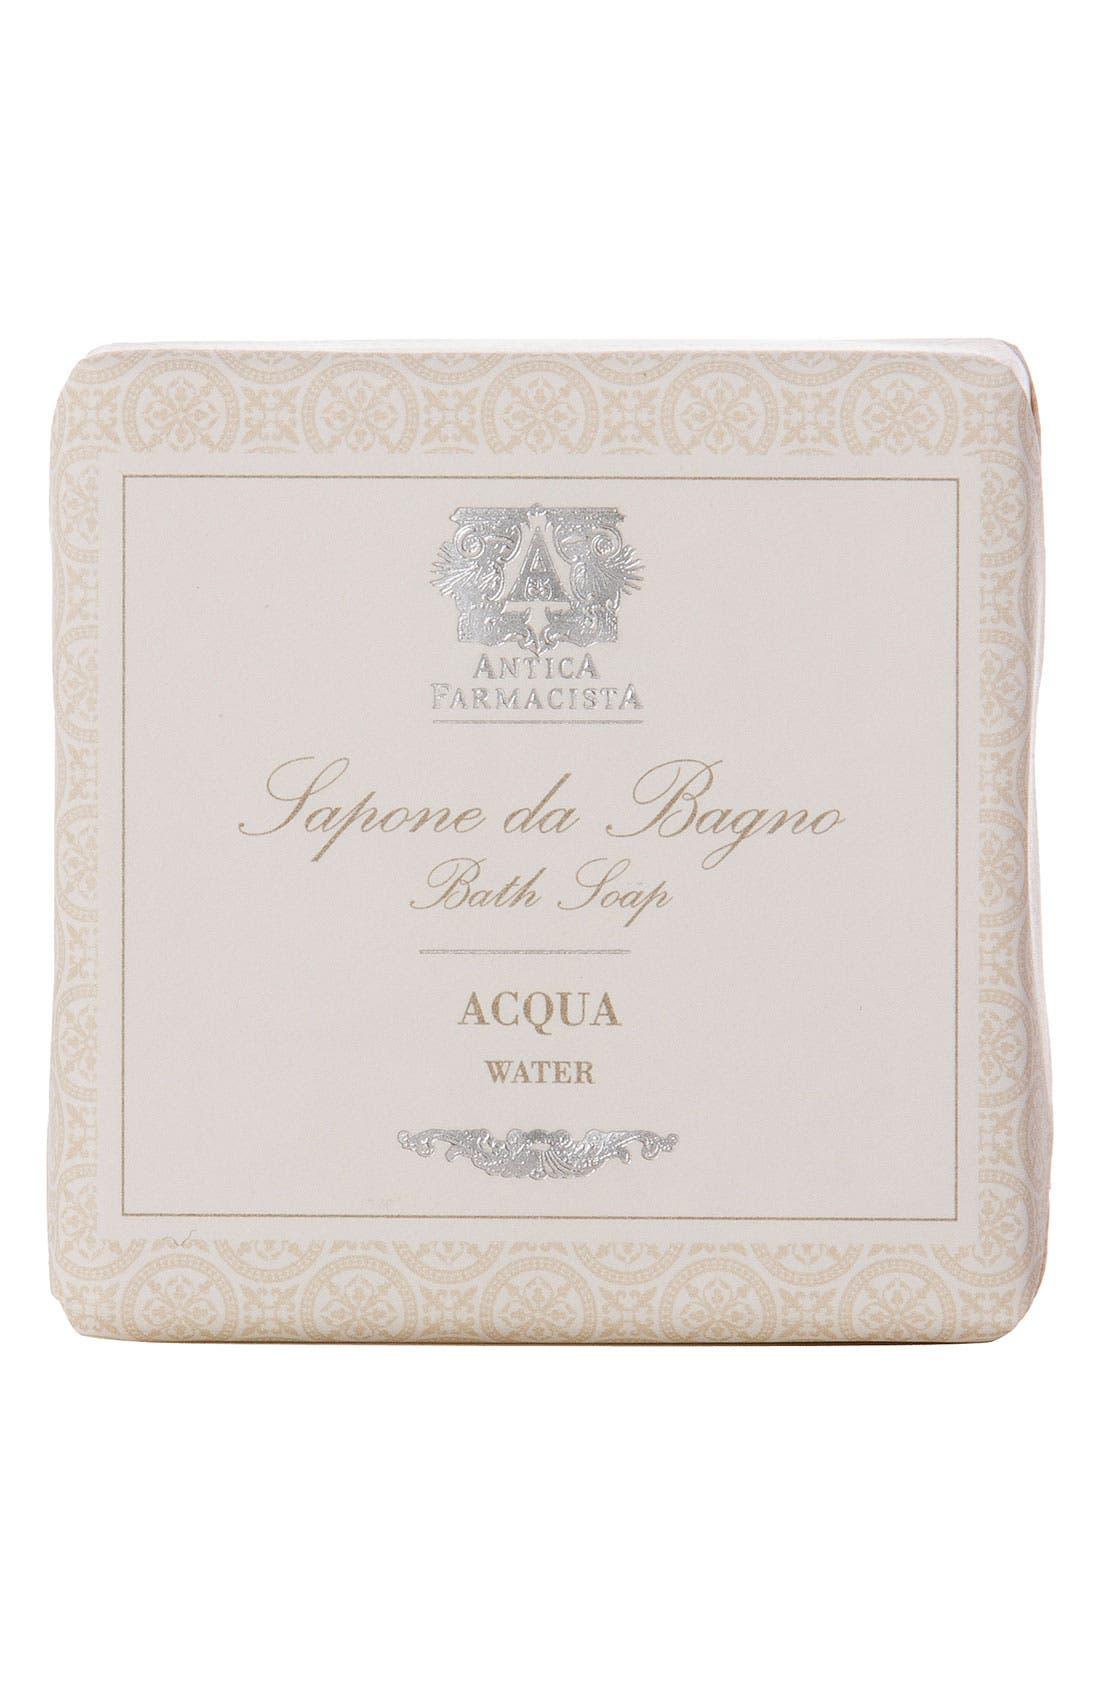 'Acqua' Bar Soap,                             Main thumbnail 1, color,                             000